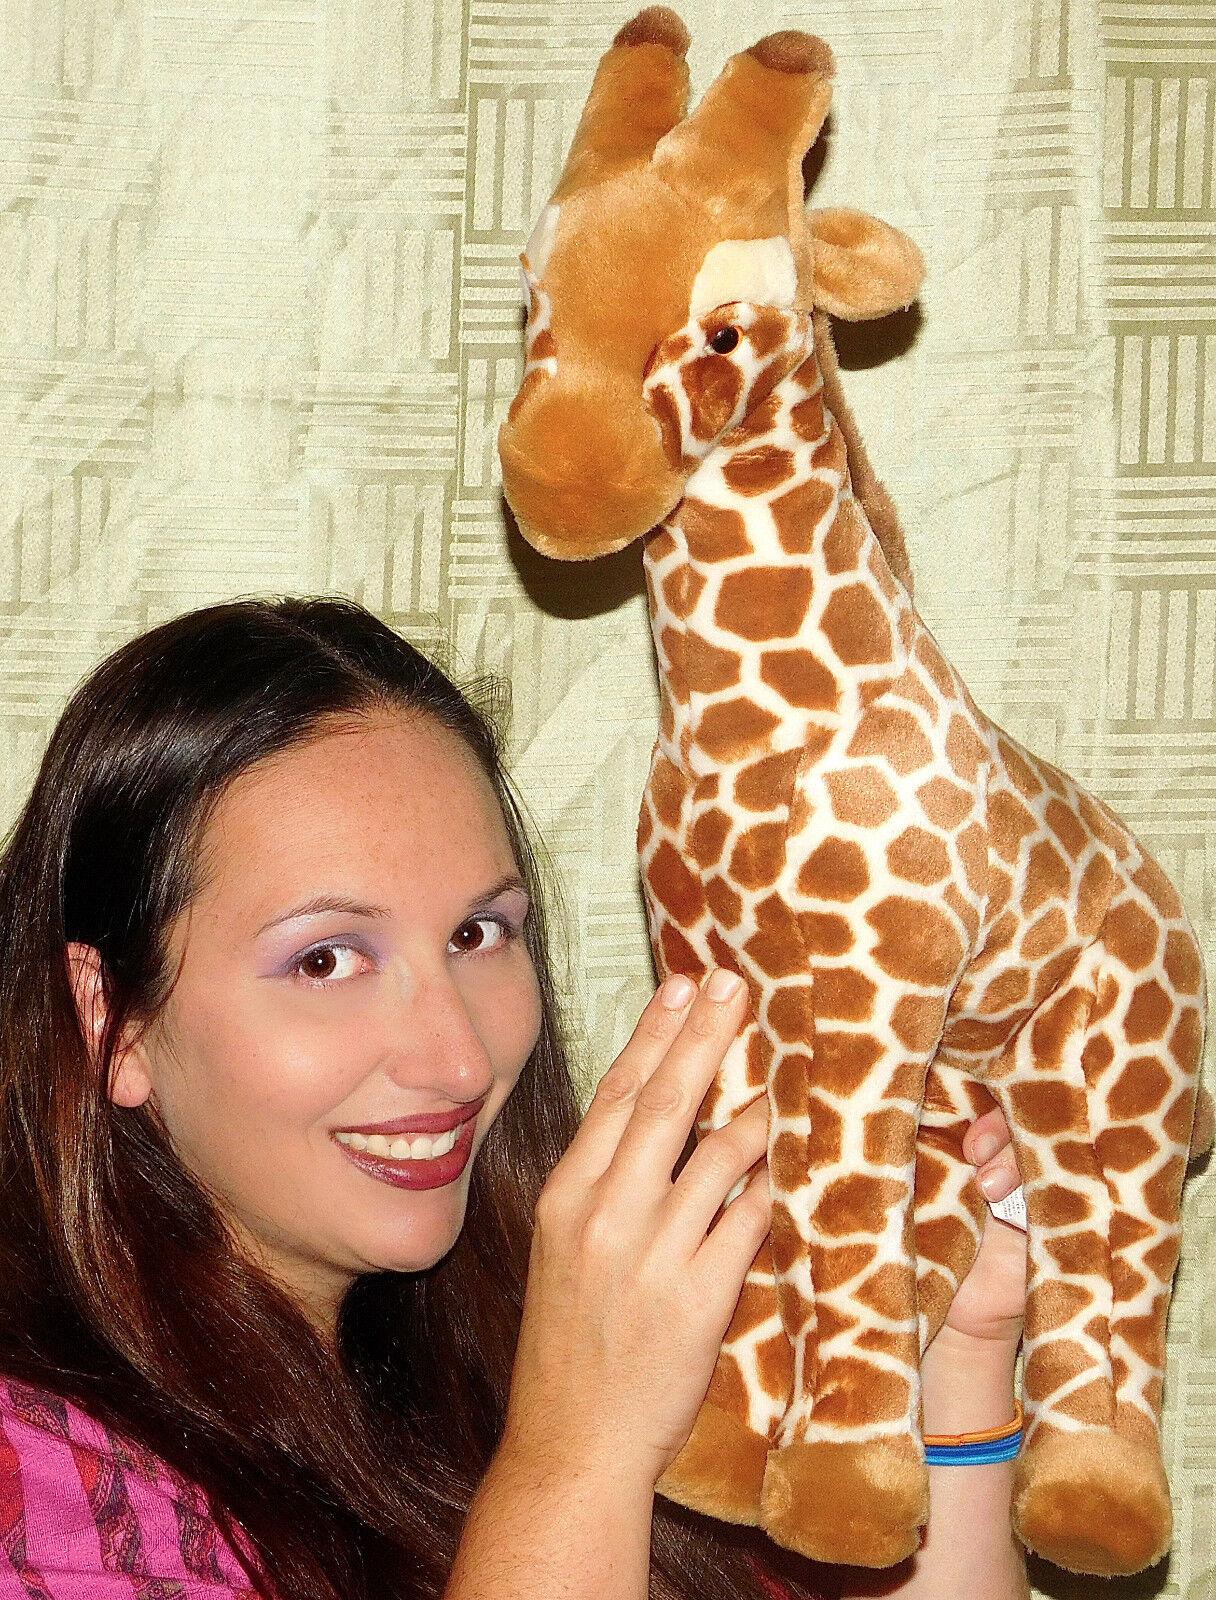 TROPHEE B.V. Giraffe Girafee Stuffed Plush Animal TOY Holland Netherlands 18